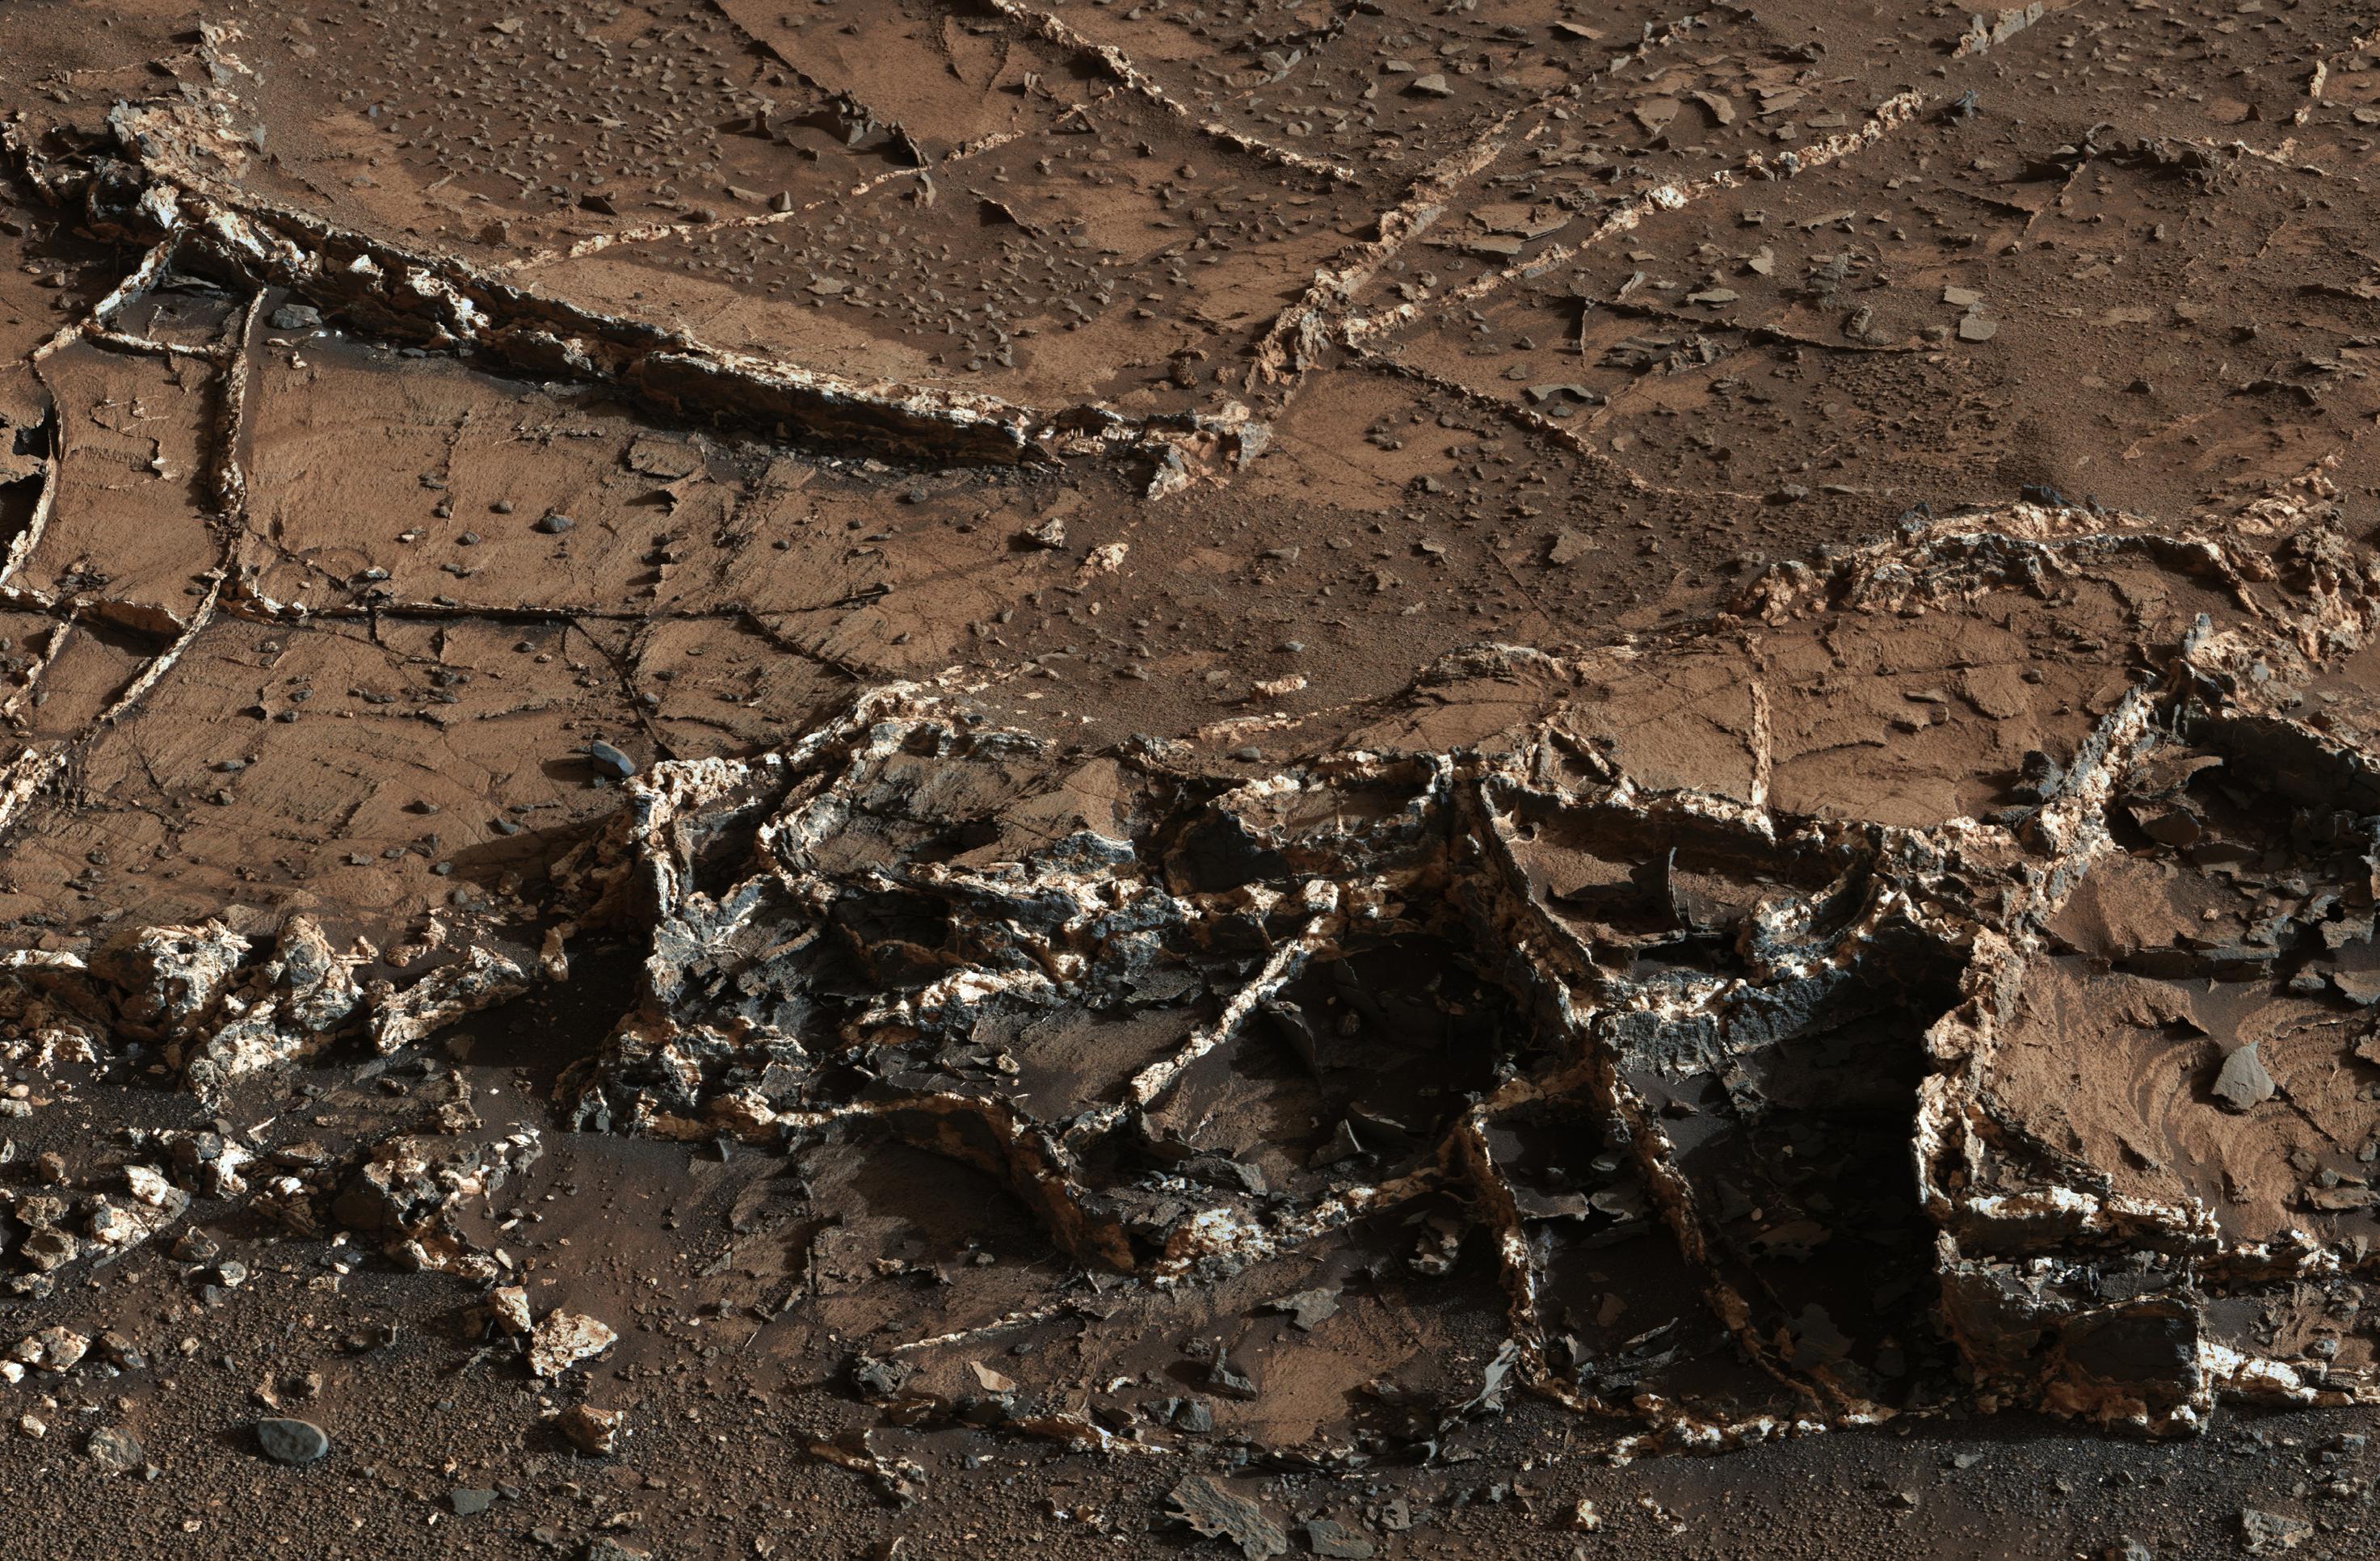 mars-veins-crop.jpg